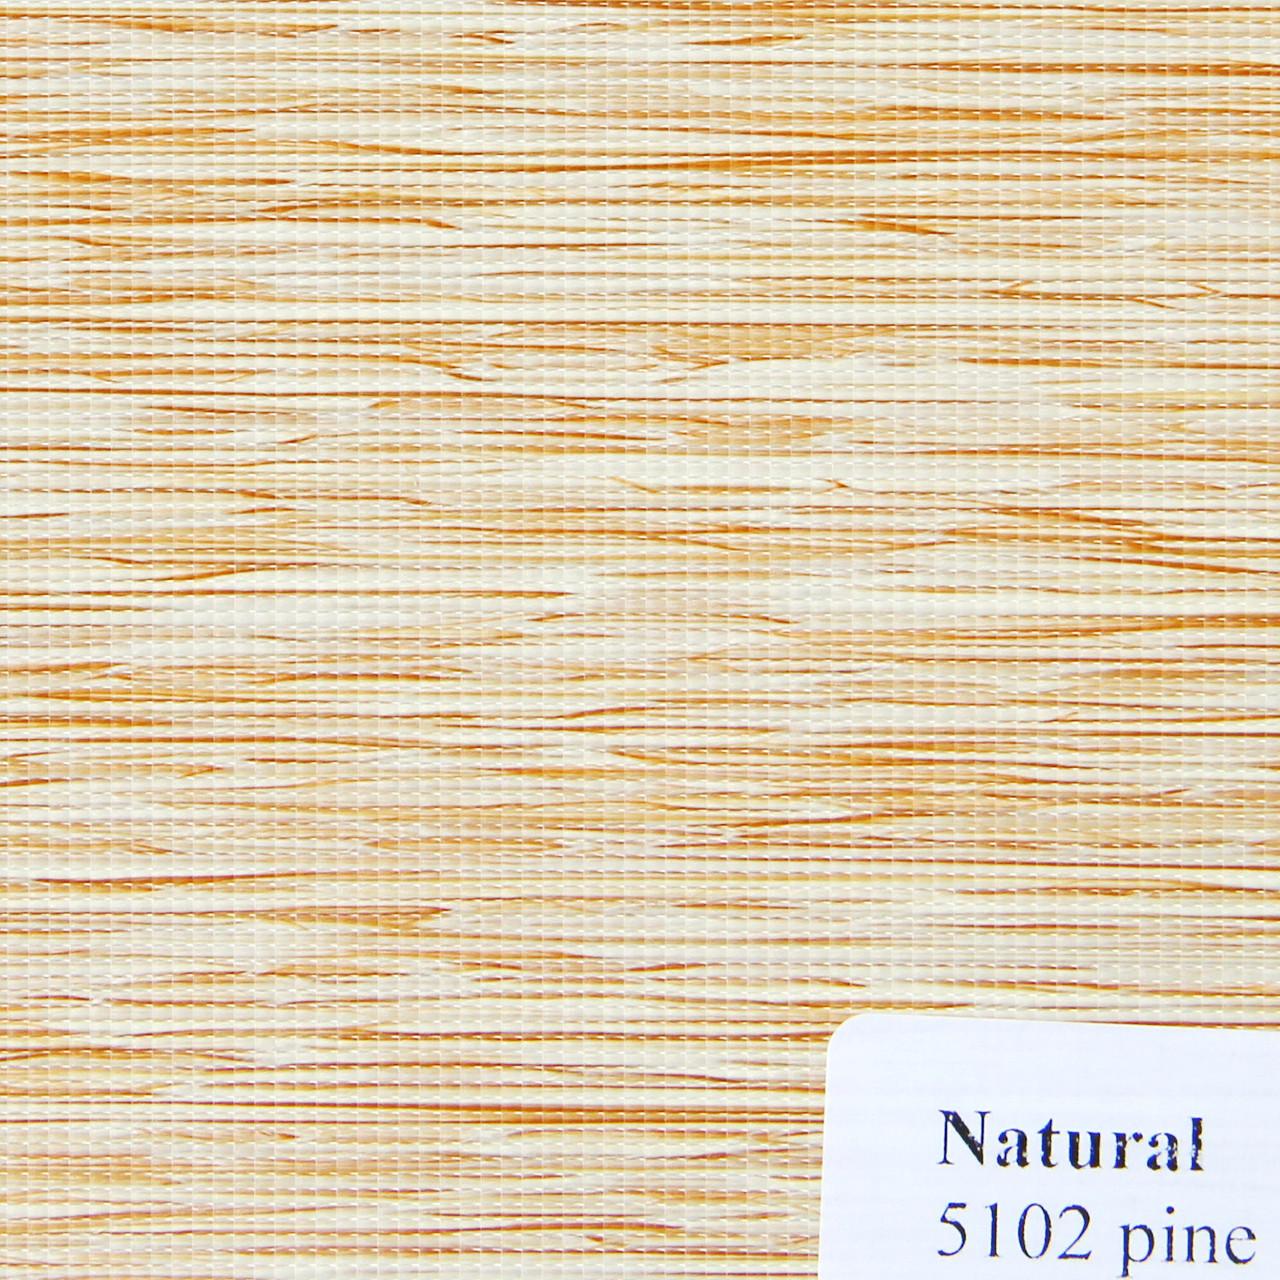 Рулонные шторы Одесса Ткань Natural Сосна 5102